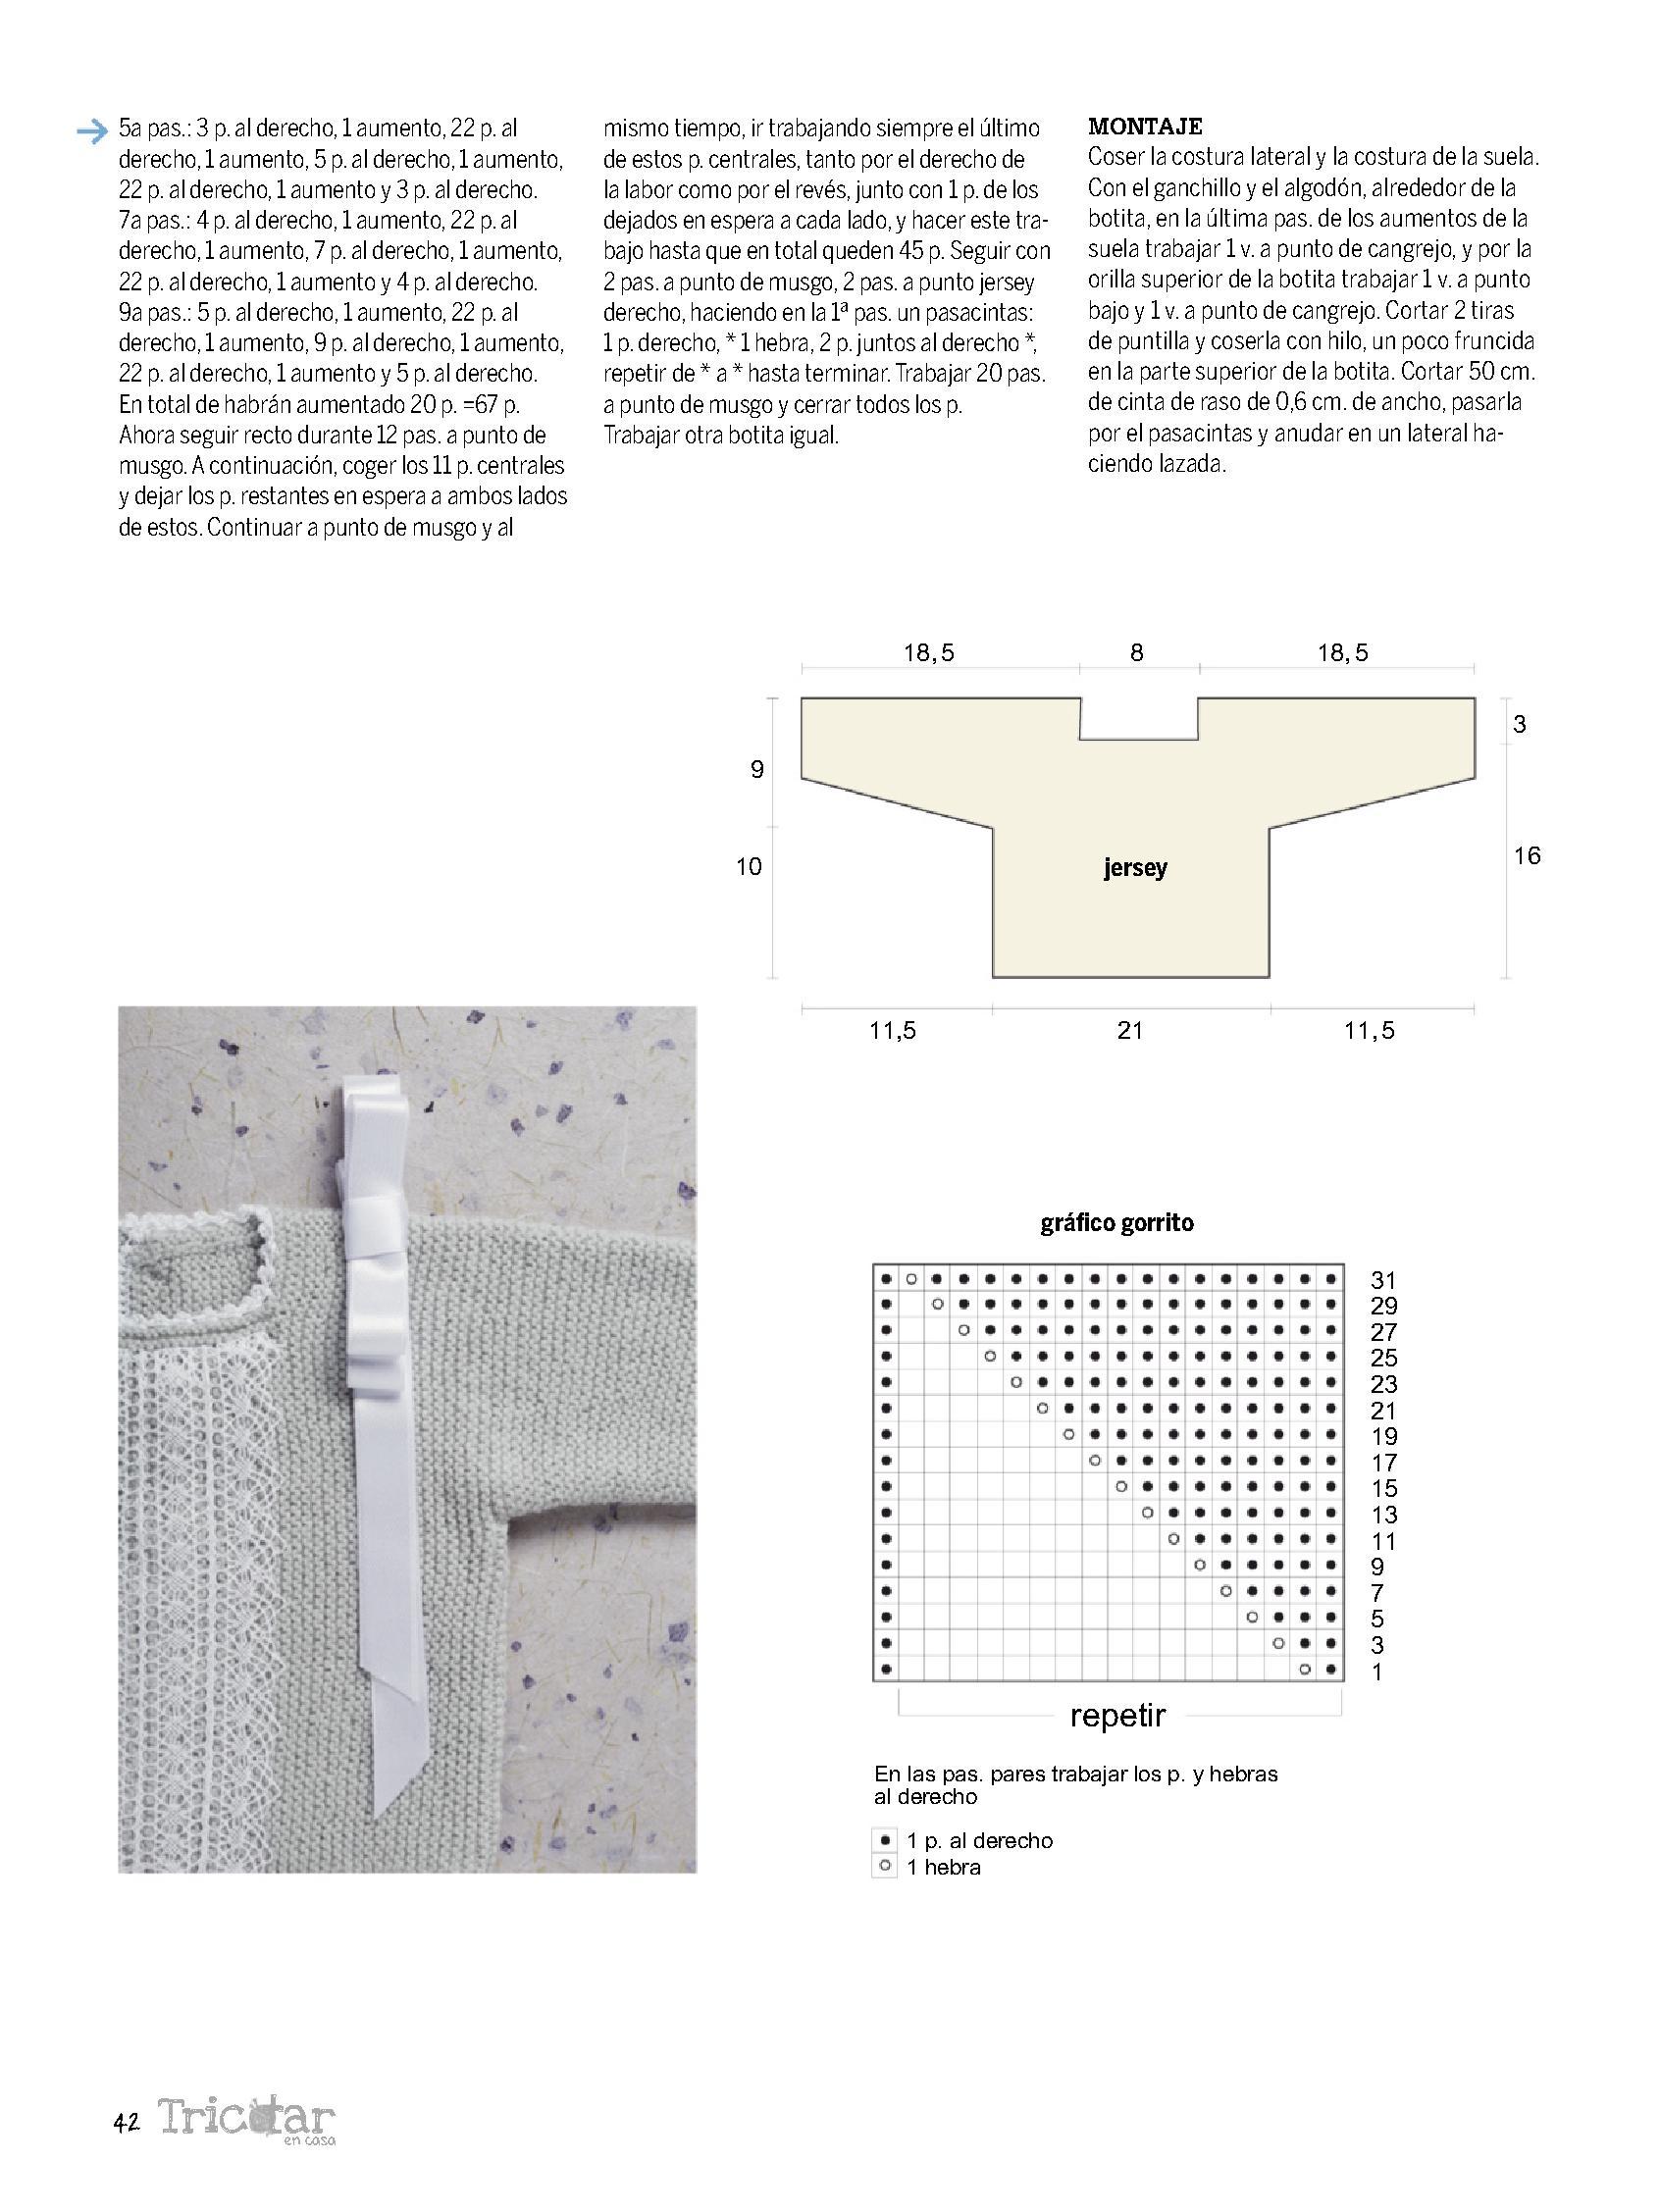 Page_00043.jpg